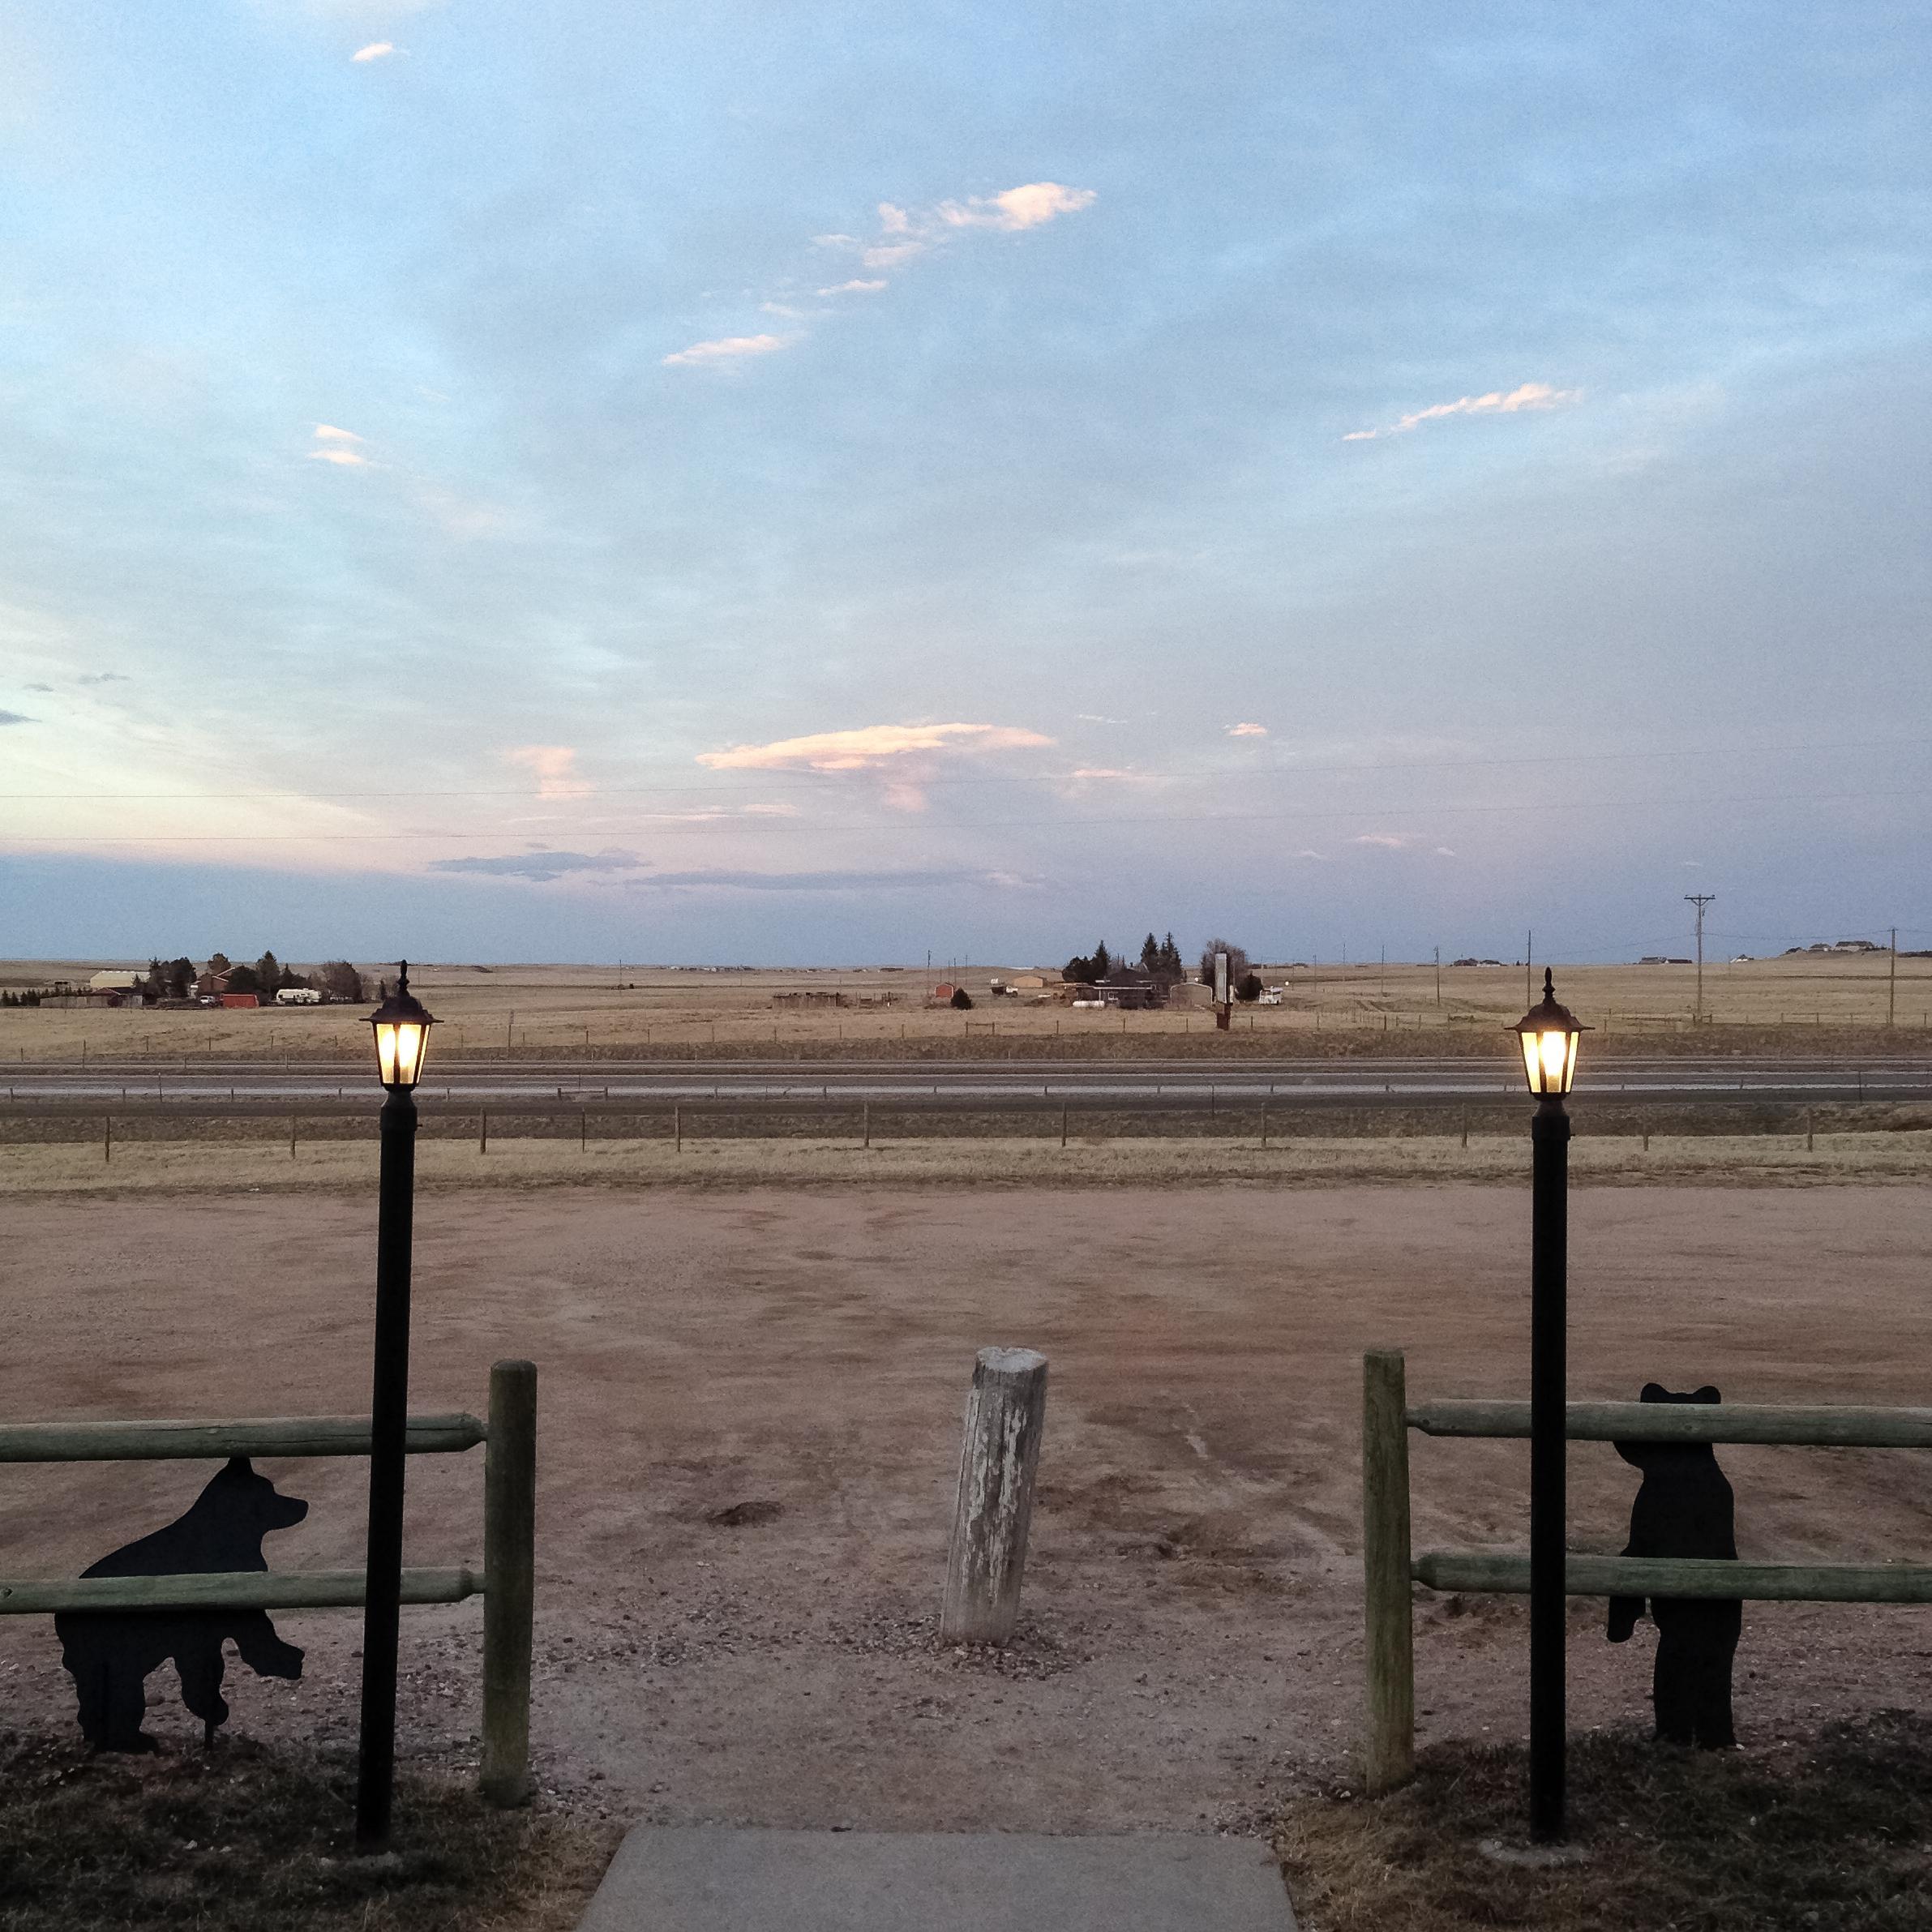 Little Bear Inn, Cheyenne, Wyoming, 2014